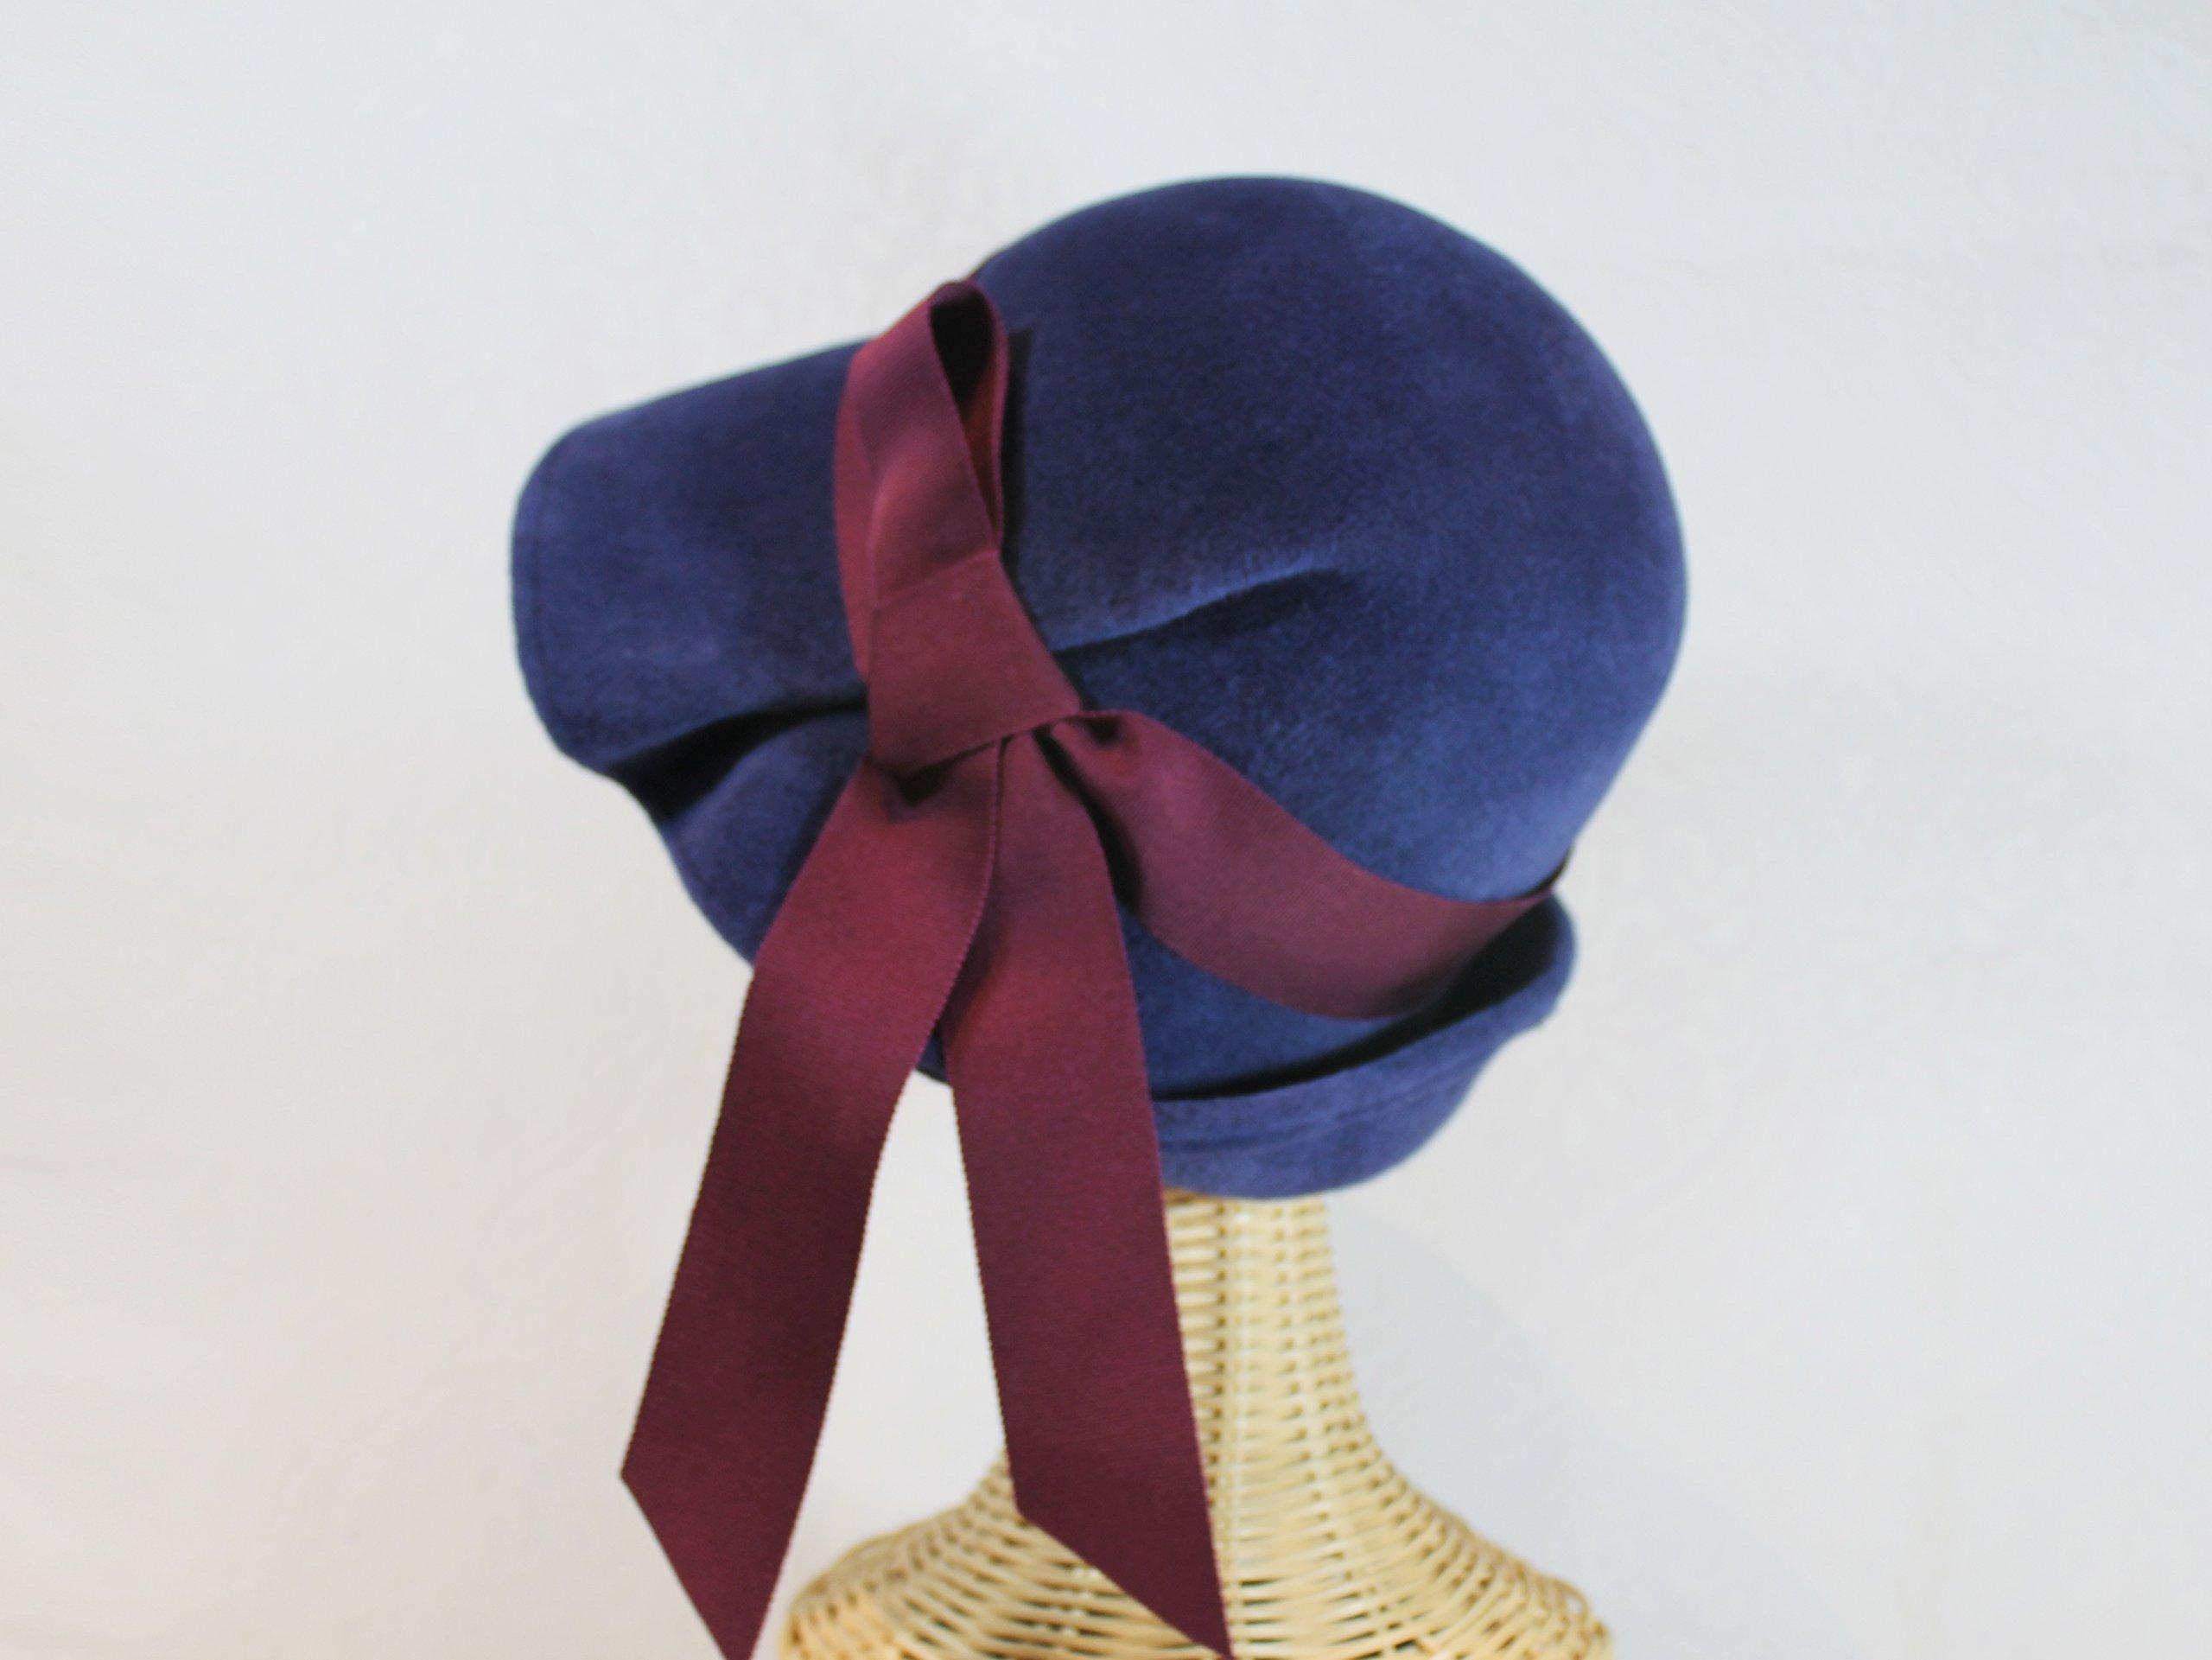 Lana Pleated Wide Brim Cloche Hat in Navy Blue Velour Felt